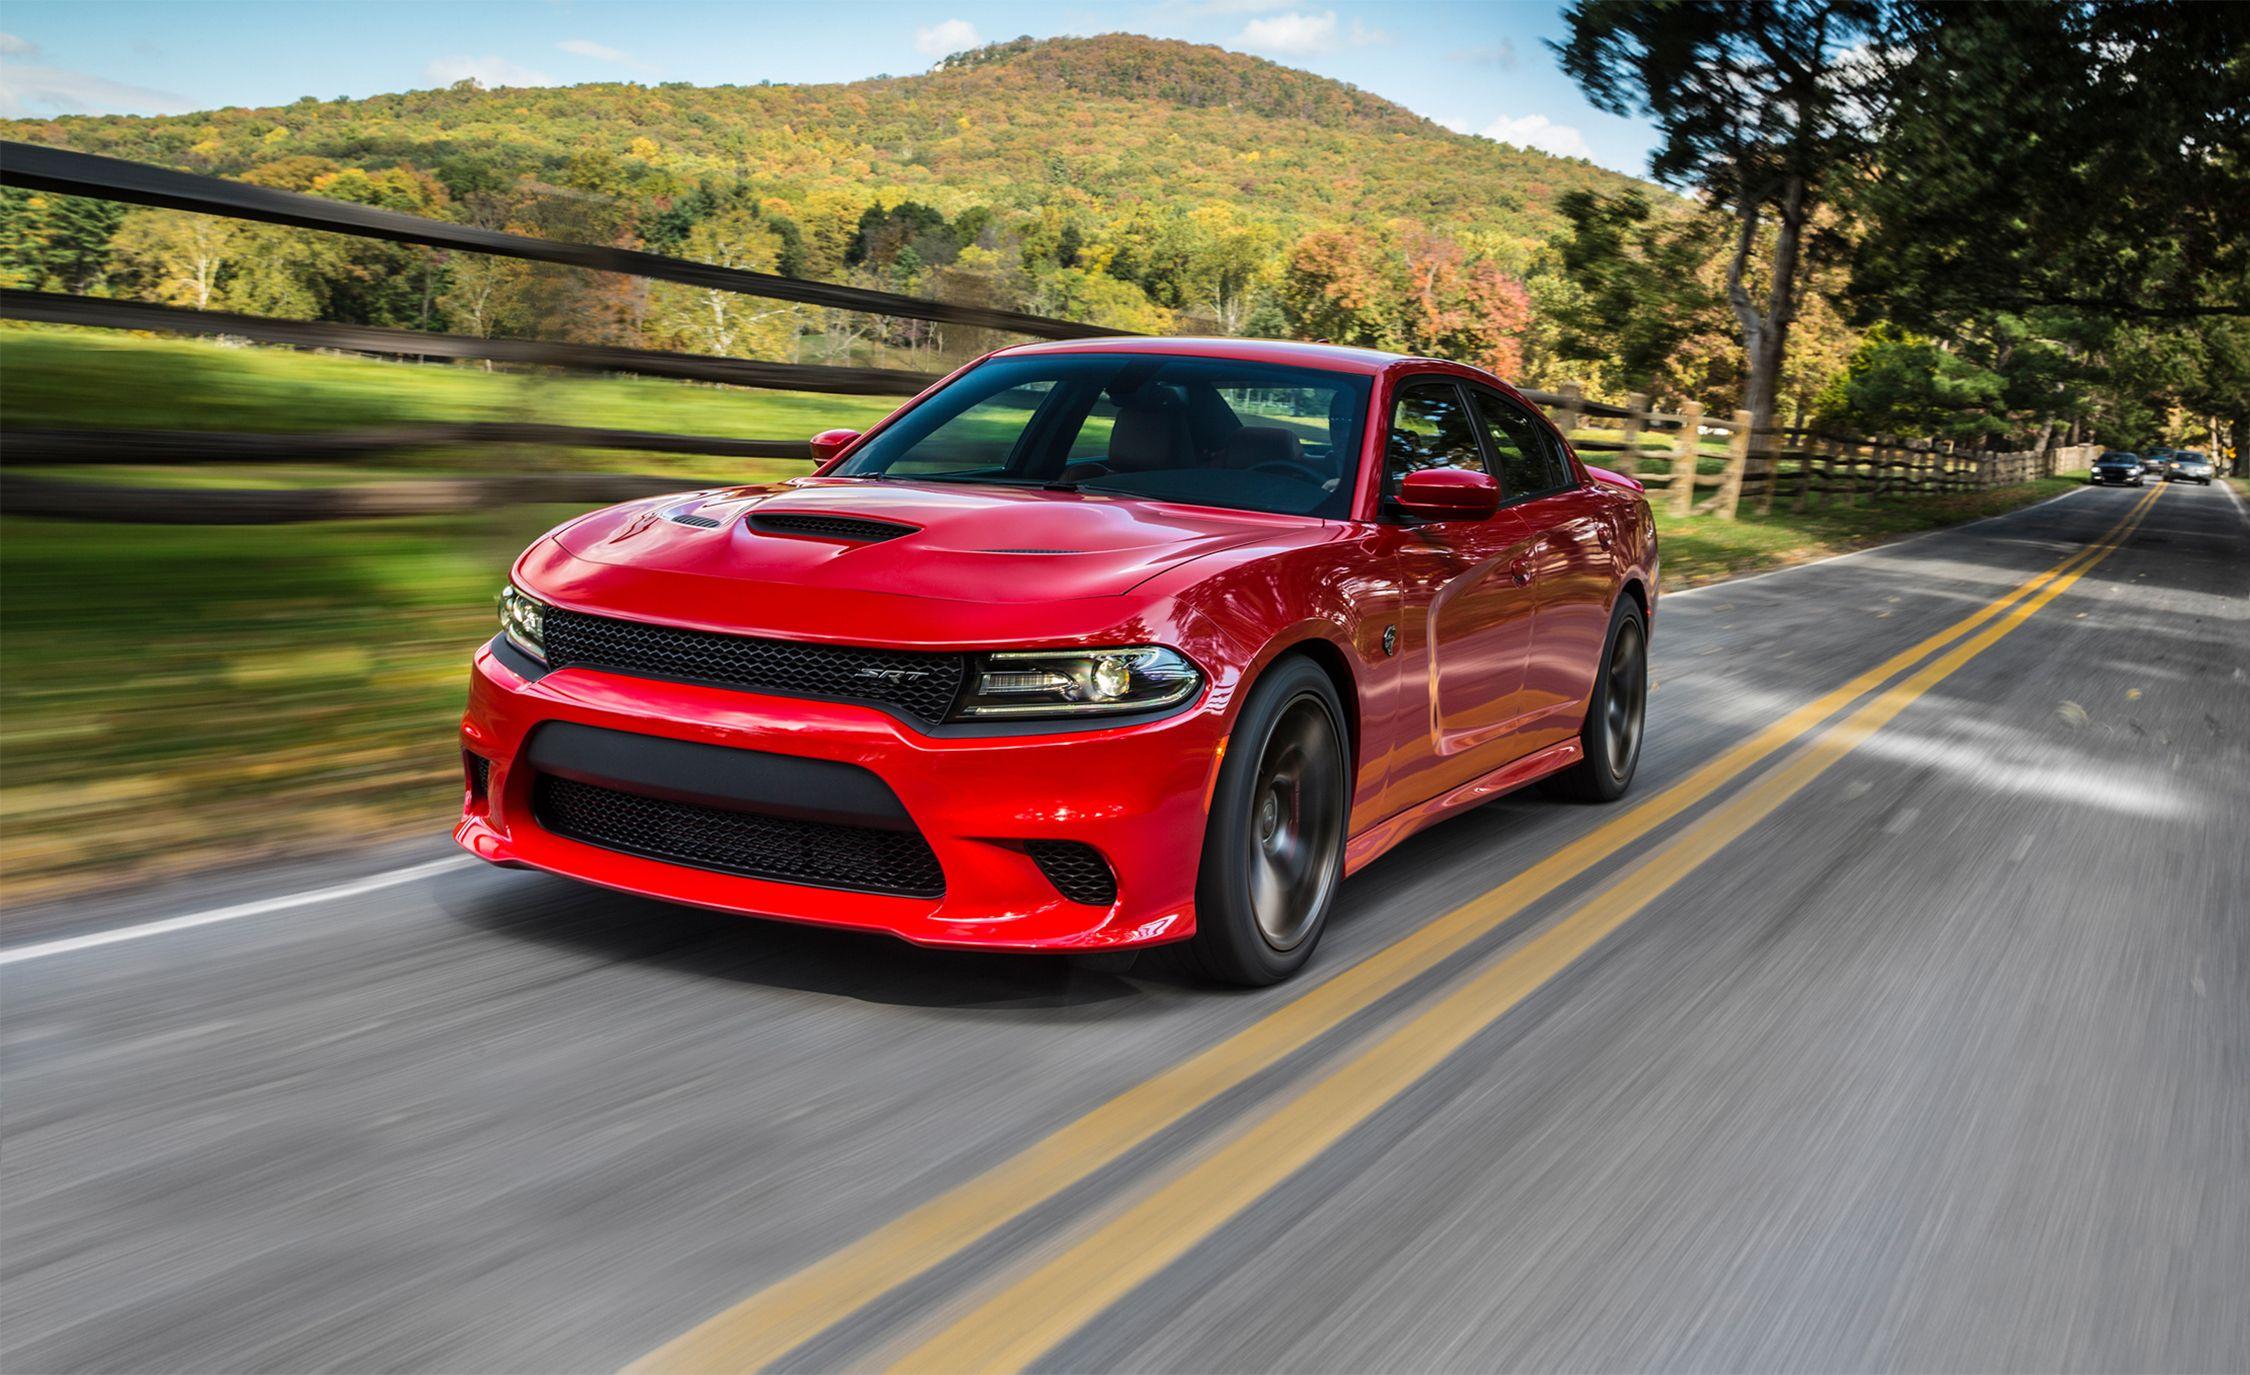 Dodge Charger Srt Srt Hellcat Reviews Dodge Charger